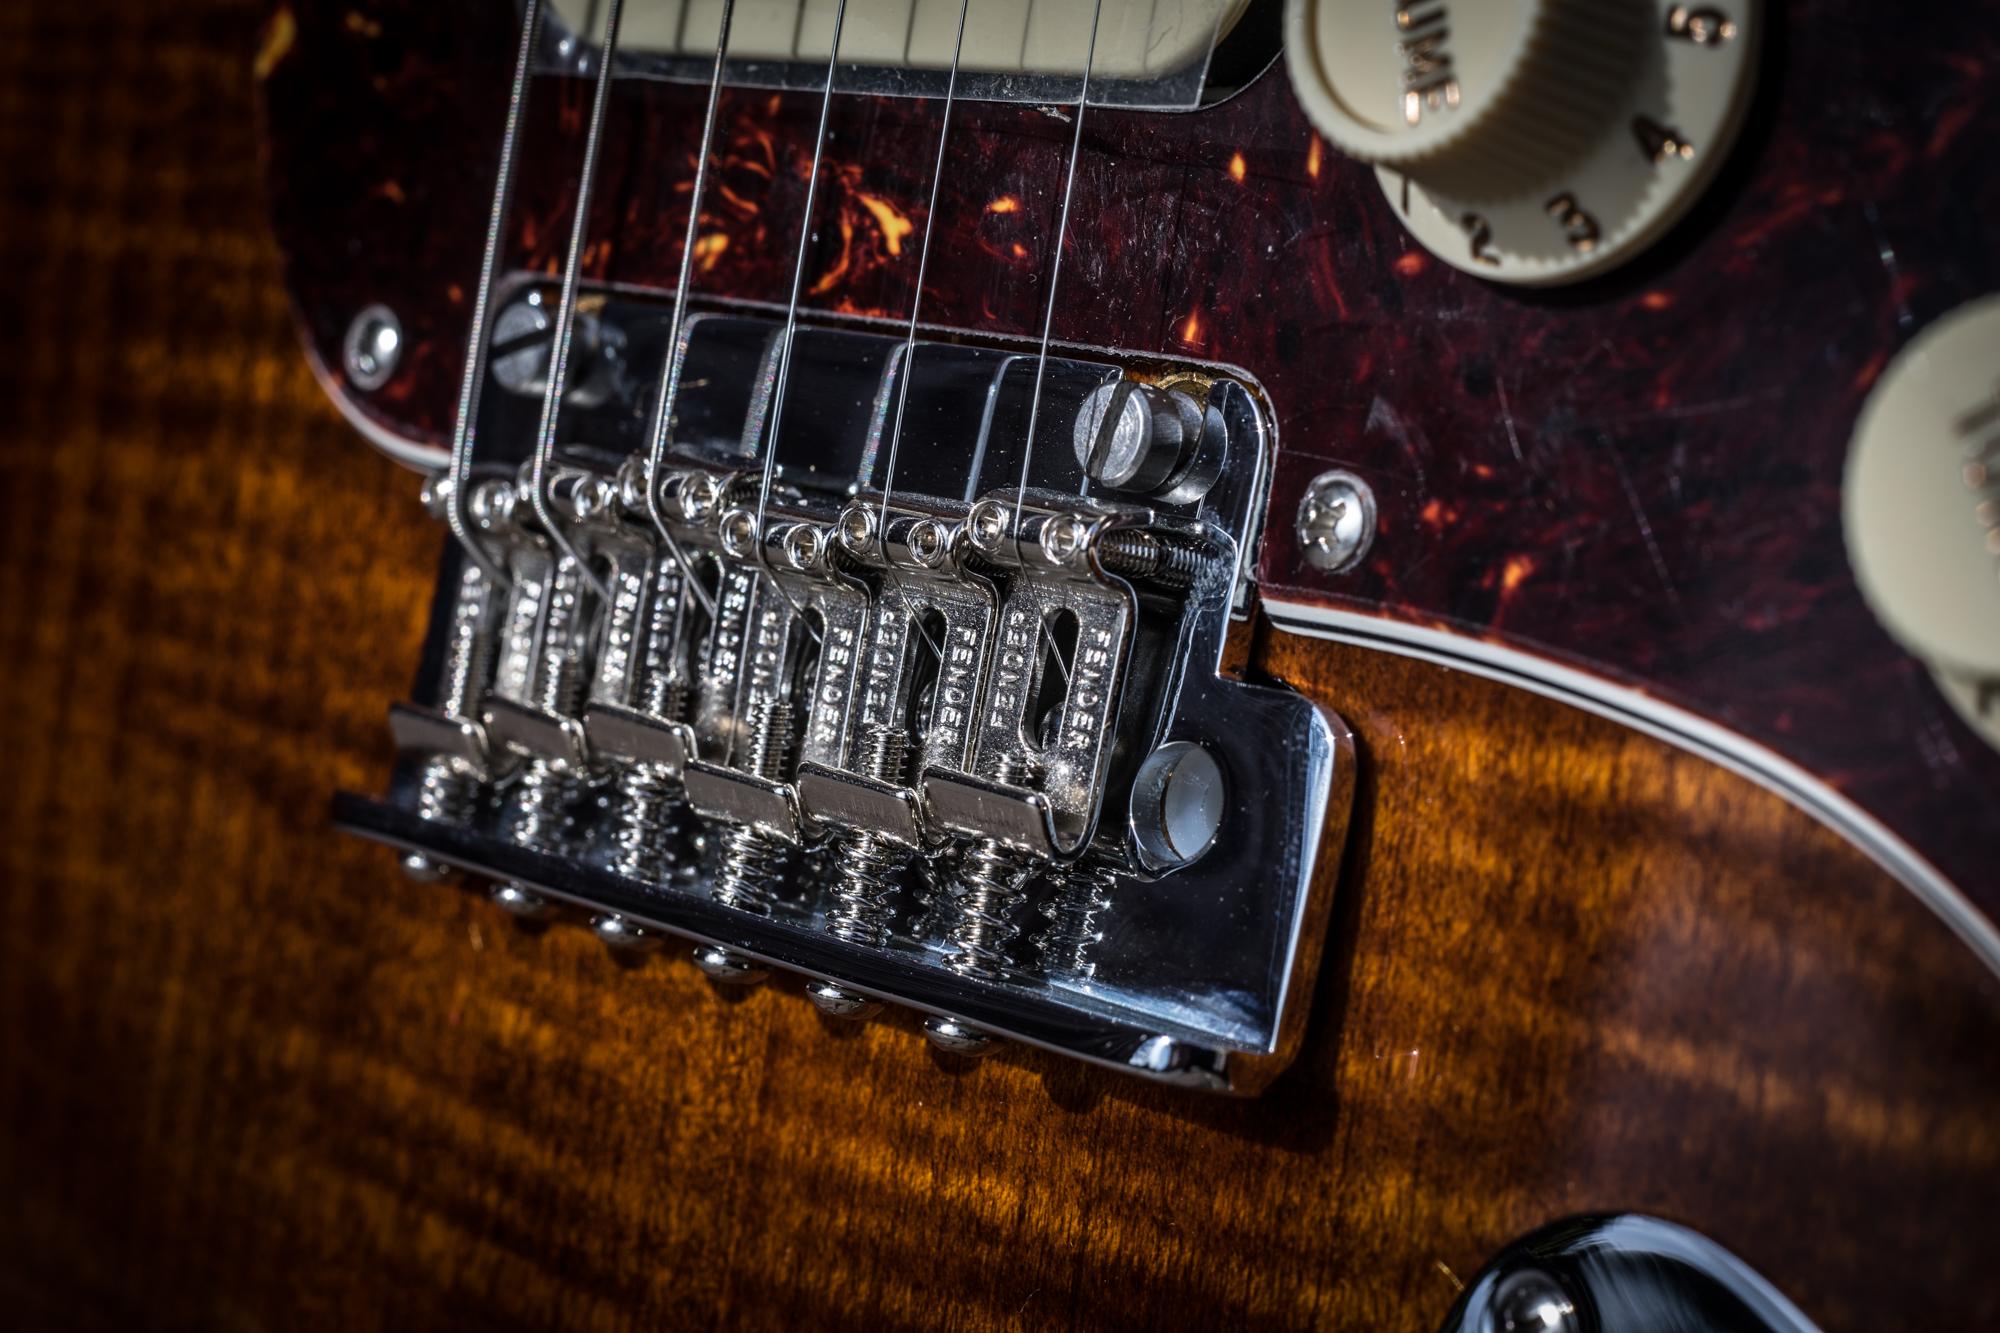 Fender Rarities Series Flame Maple Top Stratocaster - 2021 - Golden Brown - NAMM2019 Model